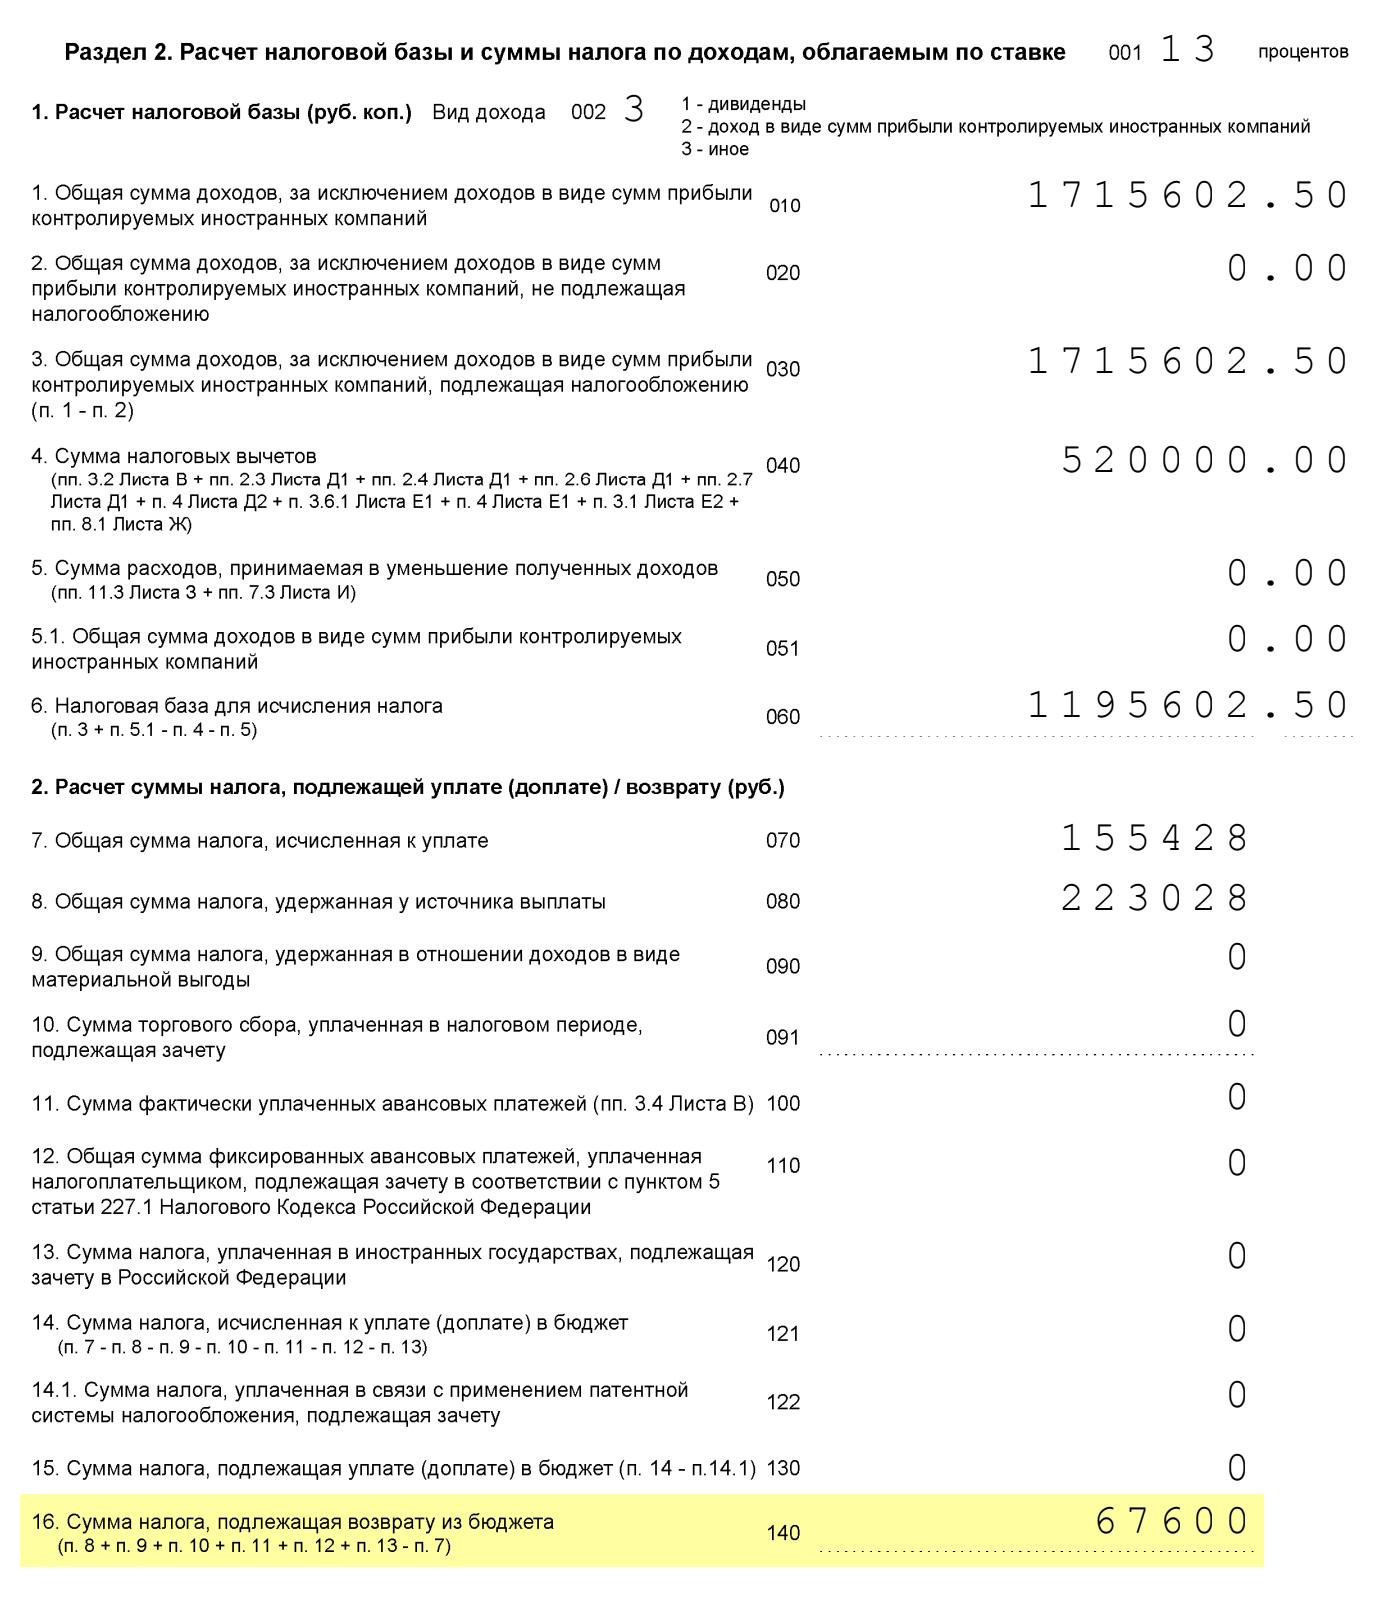 Моя декларация 3-НДФЛ за 2017&nbsp;год. Государство вернуло мне 67 600<span class=ruble>Р</span> налога